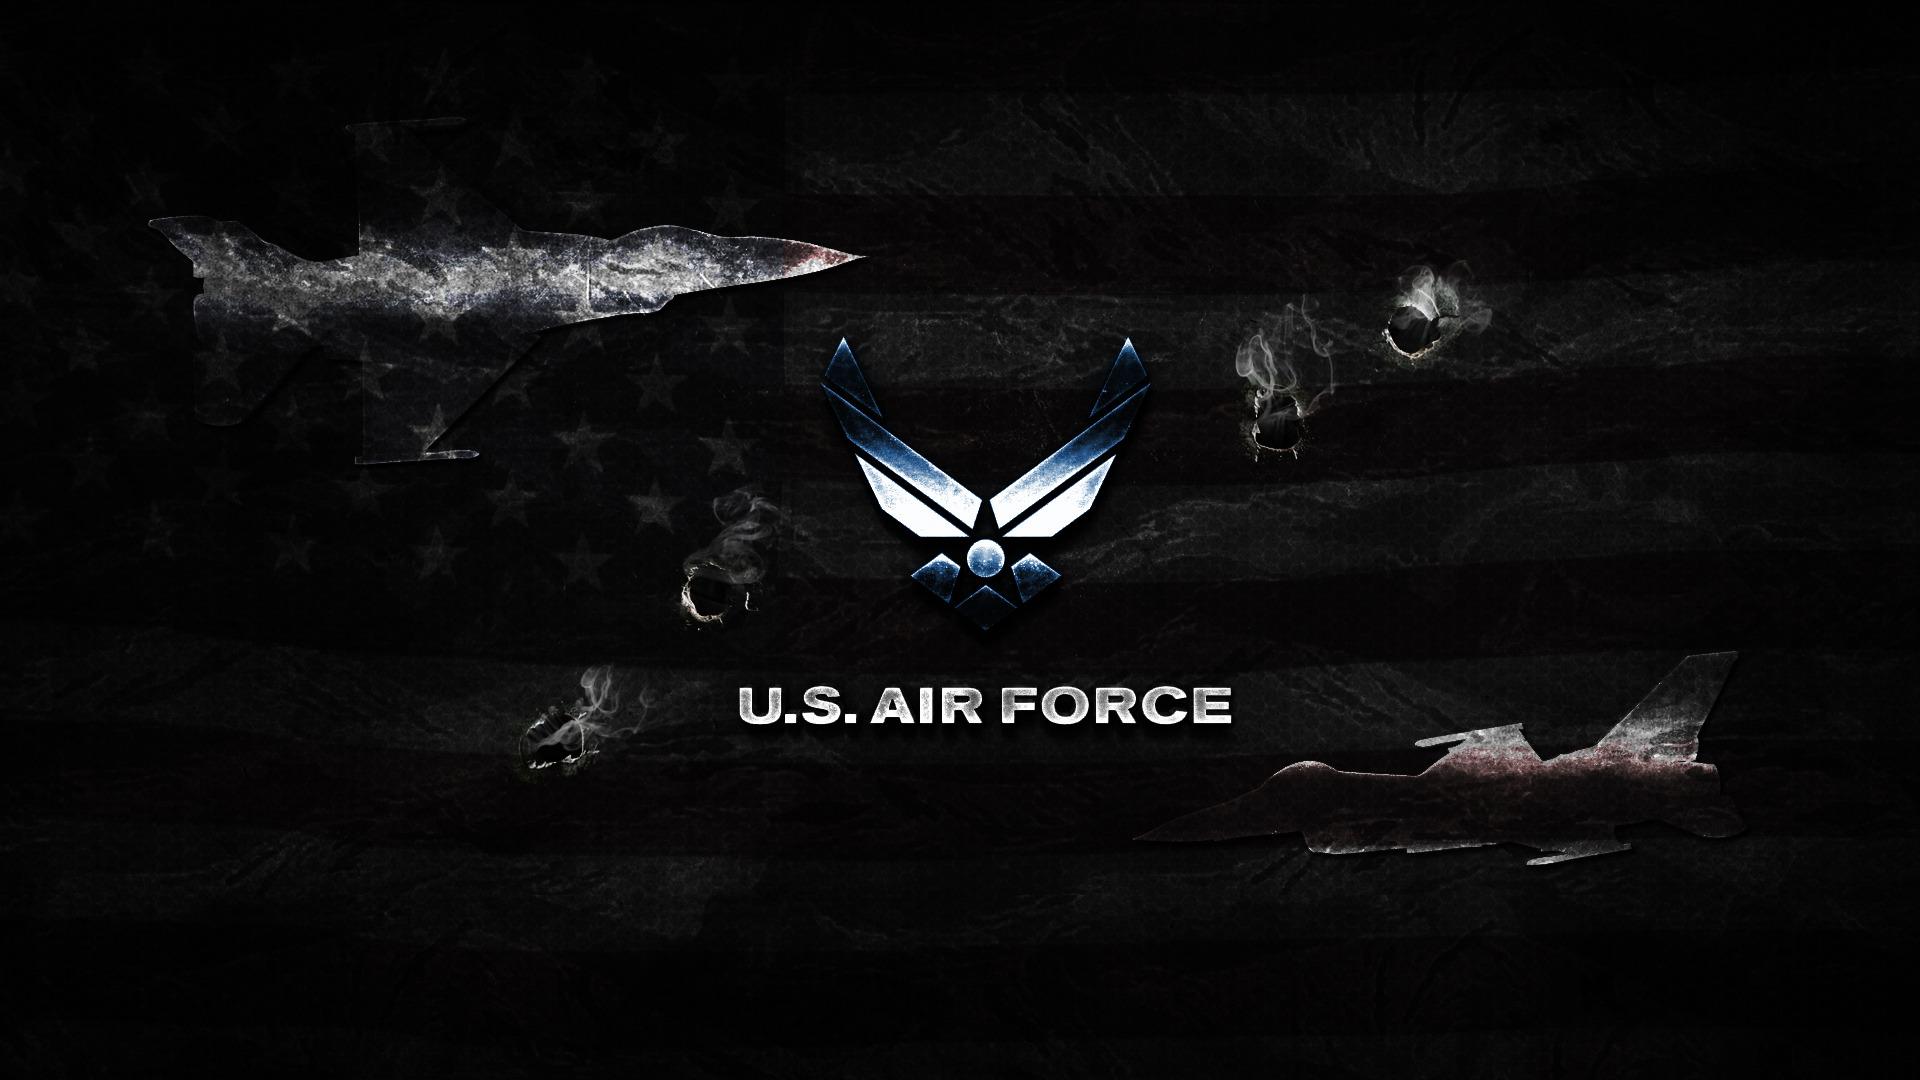 Air Force logo wallpaper 19266 1920x1080